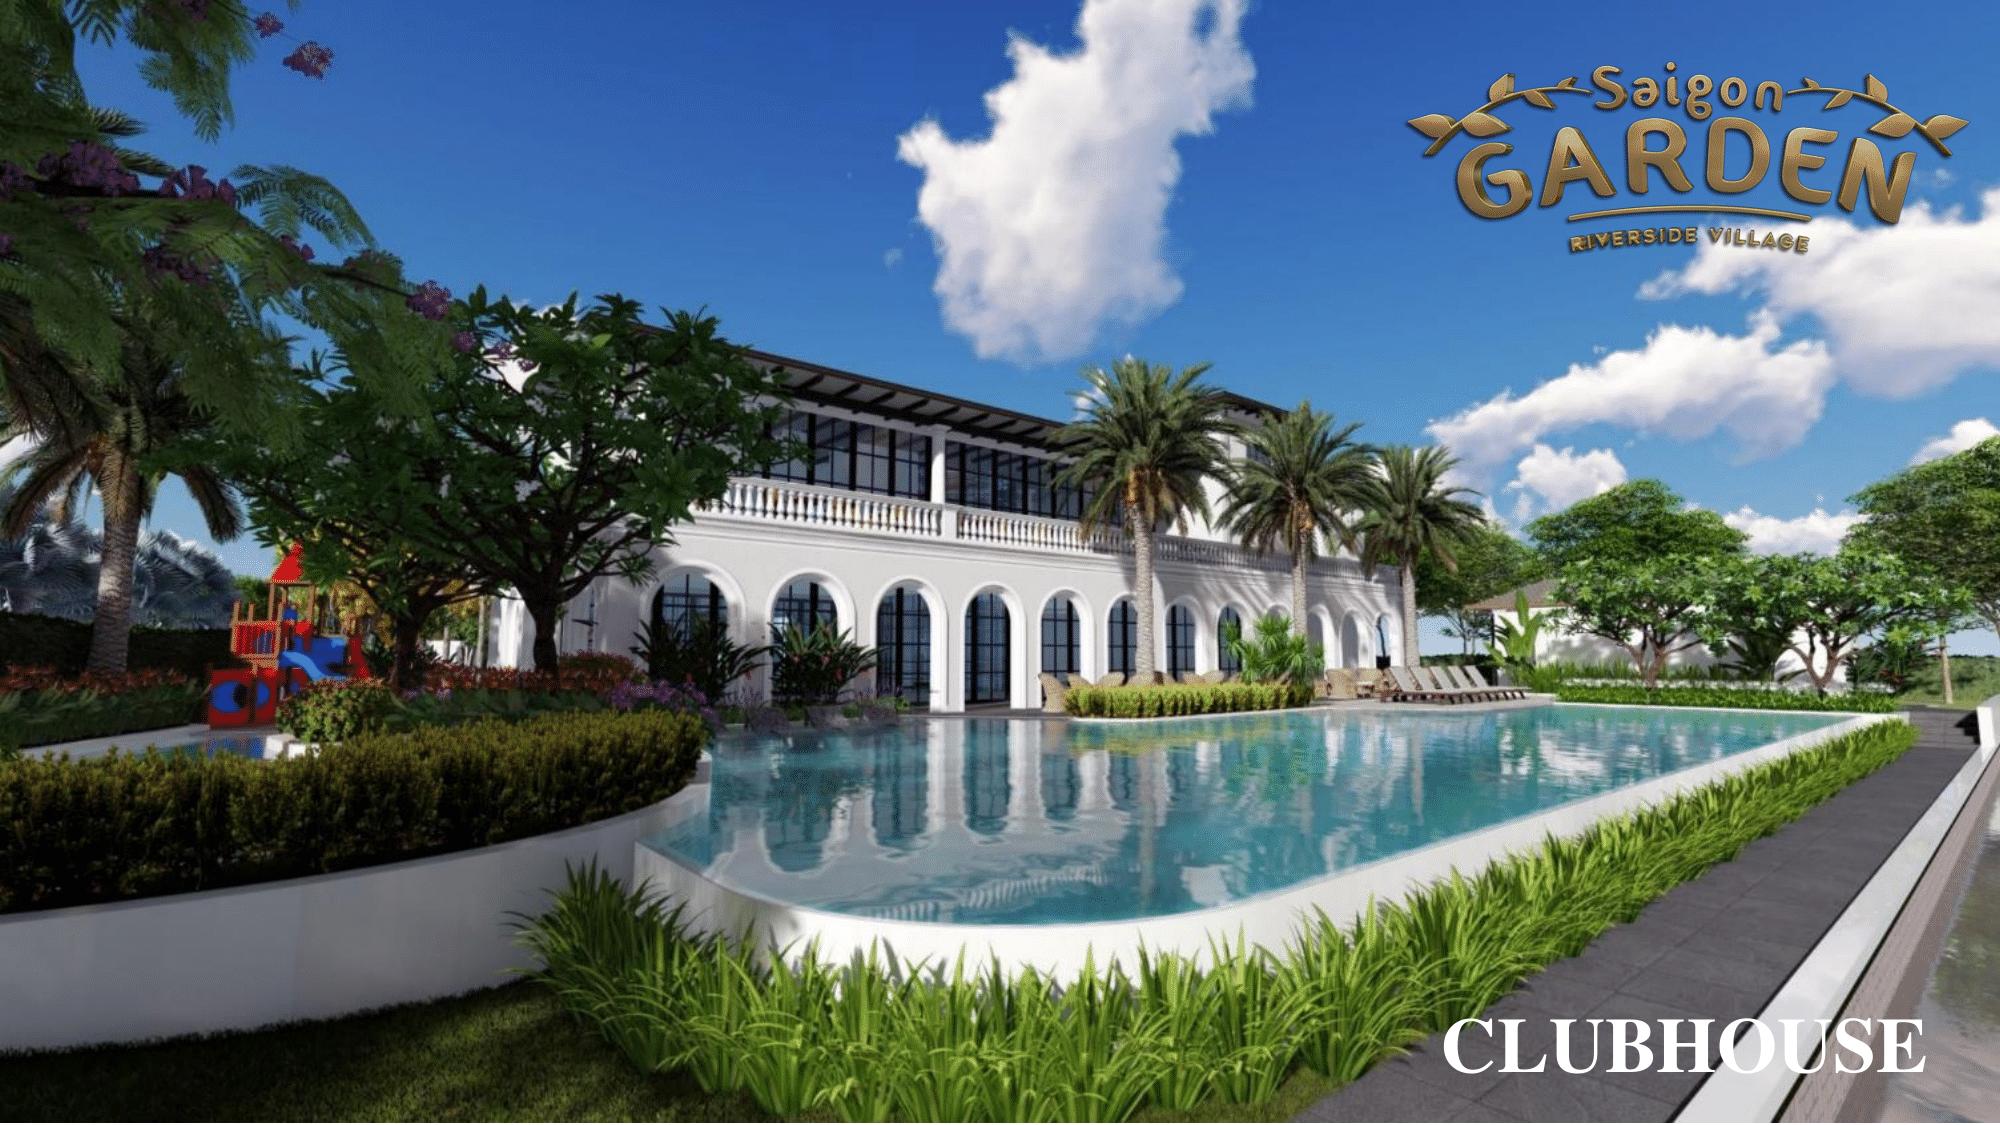 Clubhouse tại dự án Saigon Garden Riverside Village